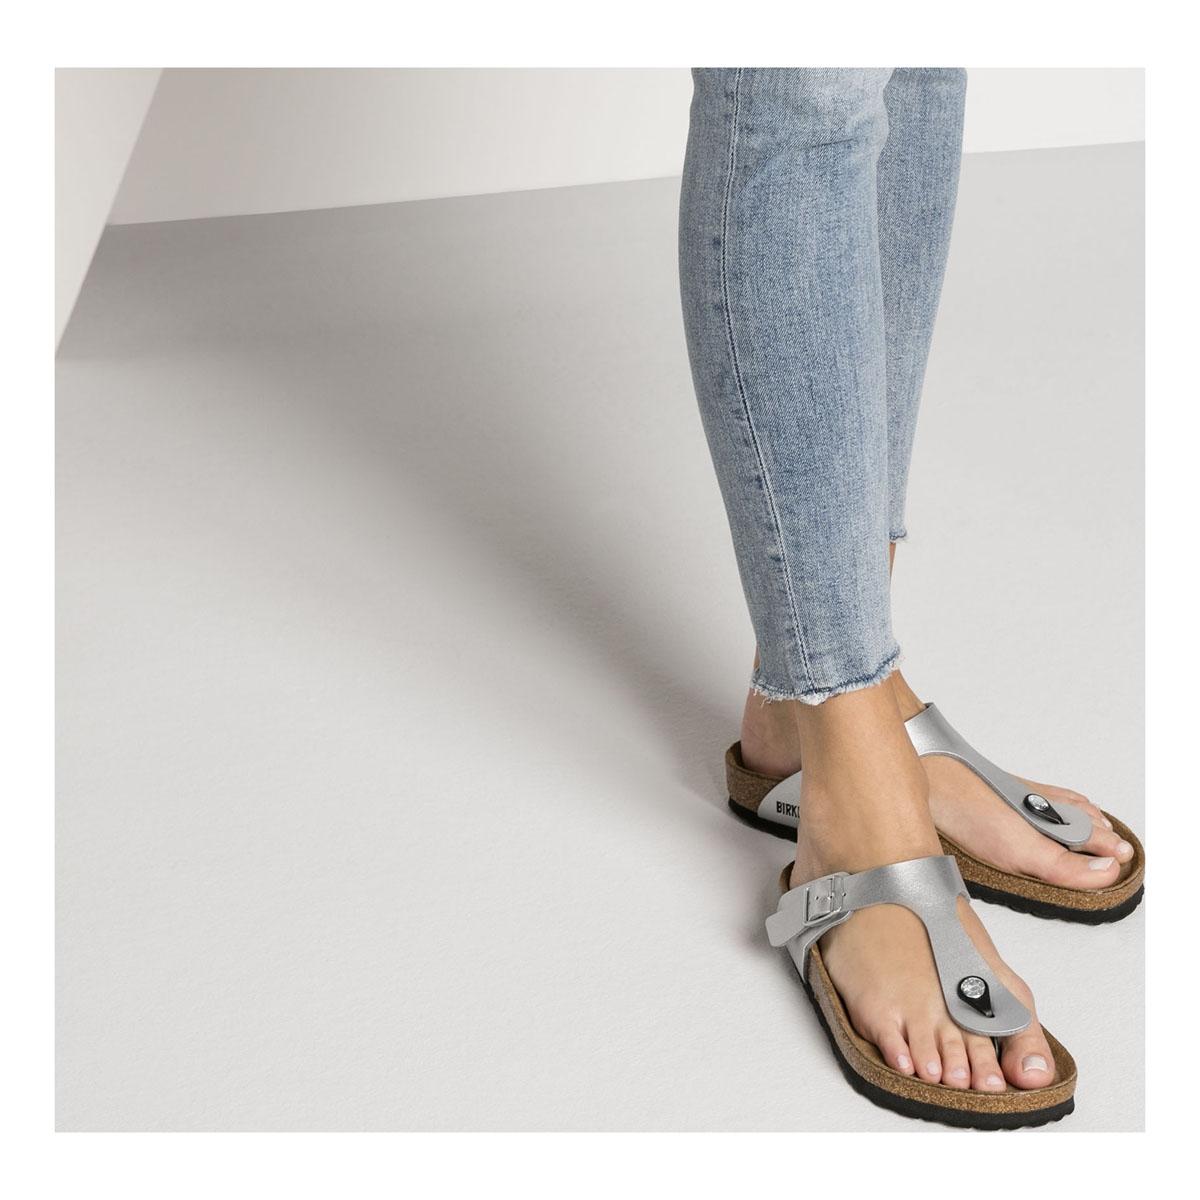 144fd7c7422 ... Image of Birkenstock Gizeh Birko-Flor Synthetic Leather Sandals  (Women s) - Silver